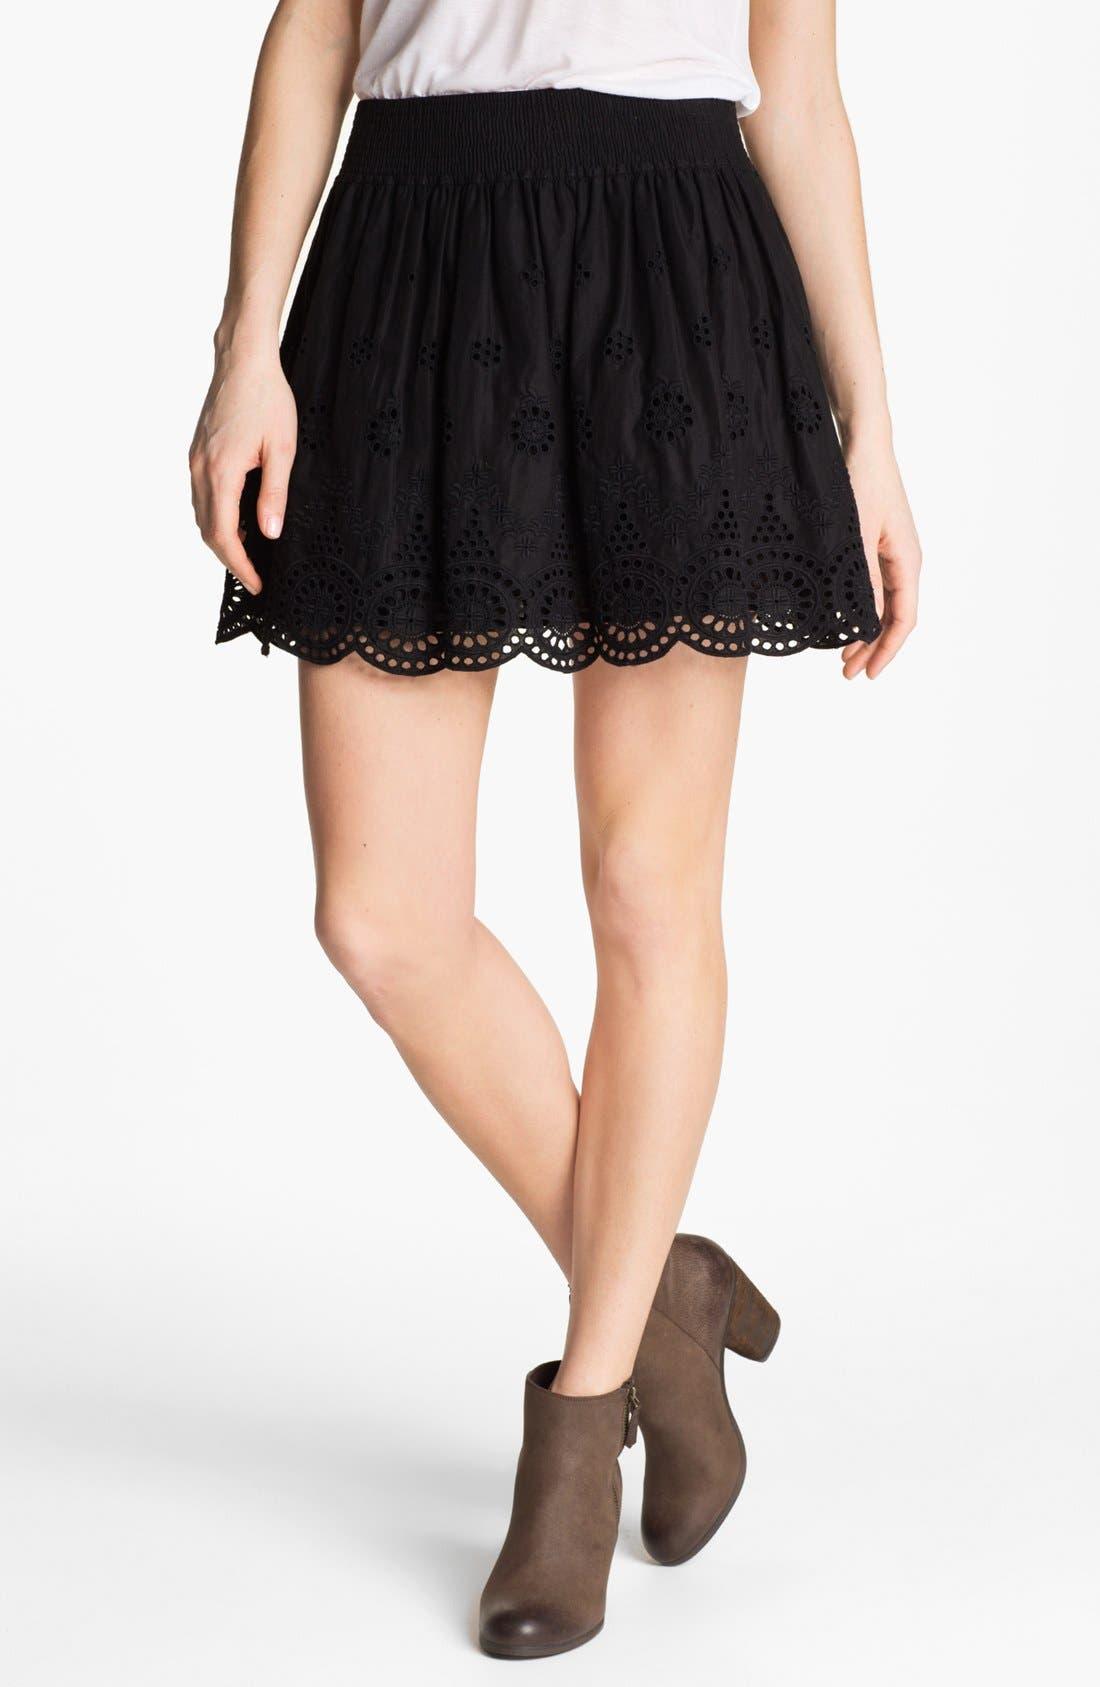 Alternate Image 1 Selected - Hinge® Eyelet Embroidered Skirt